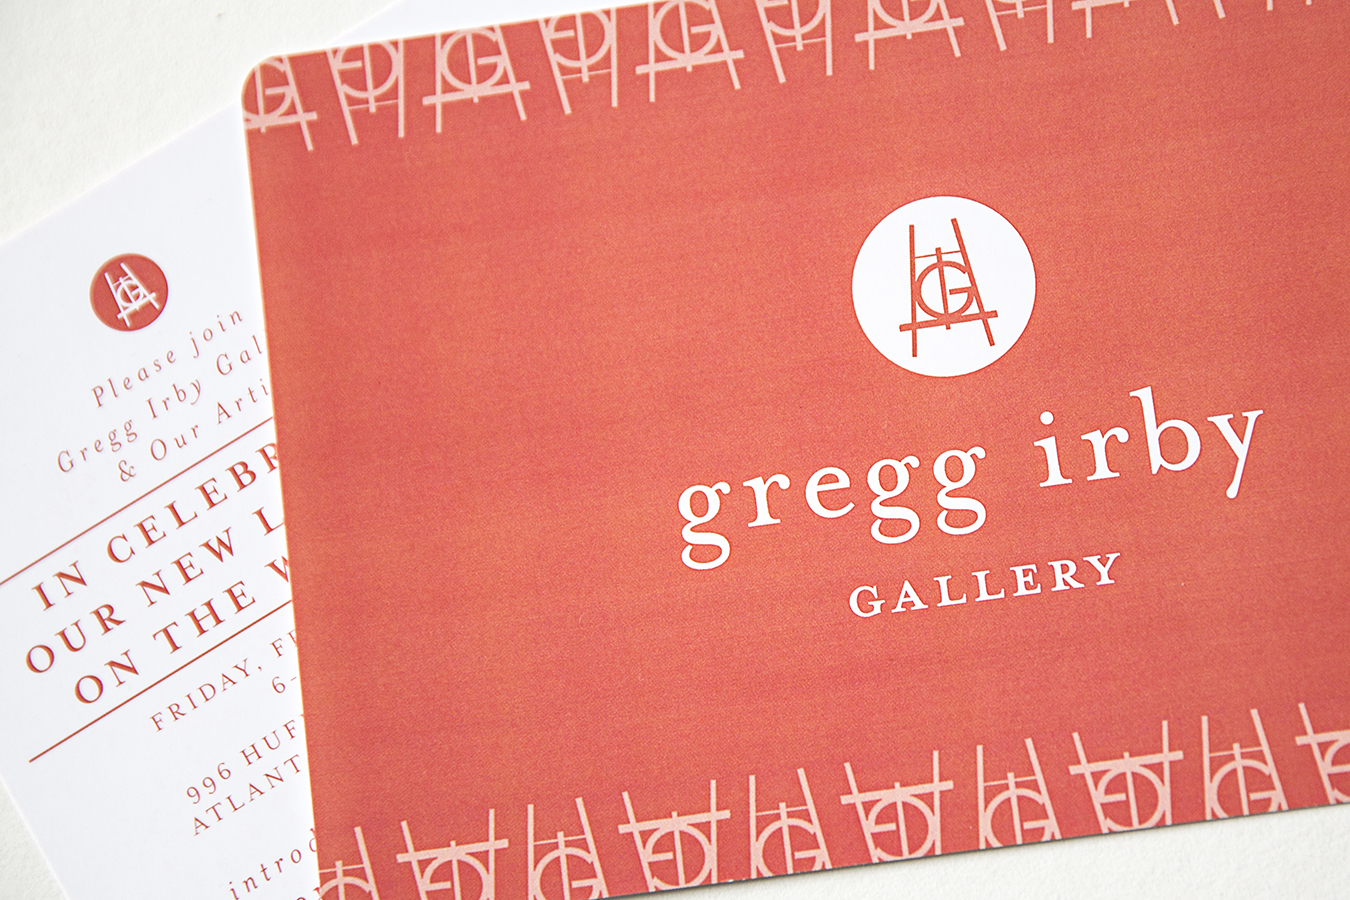 Branding: Gregg Irby Gallery, Atlanta, GA